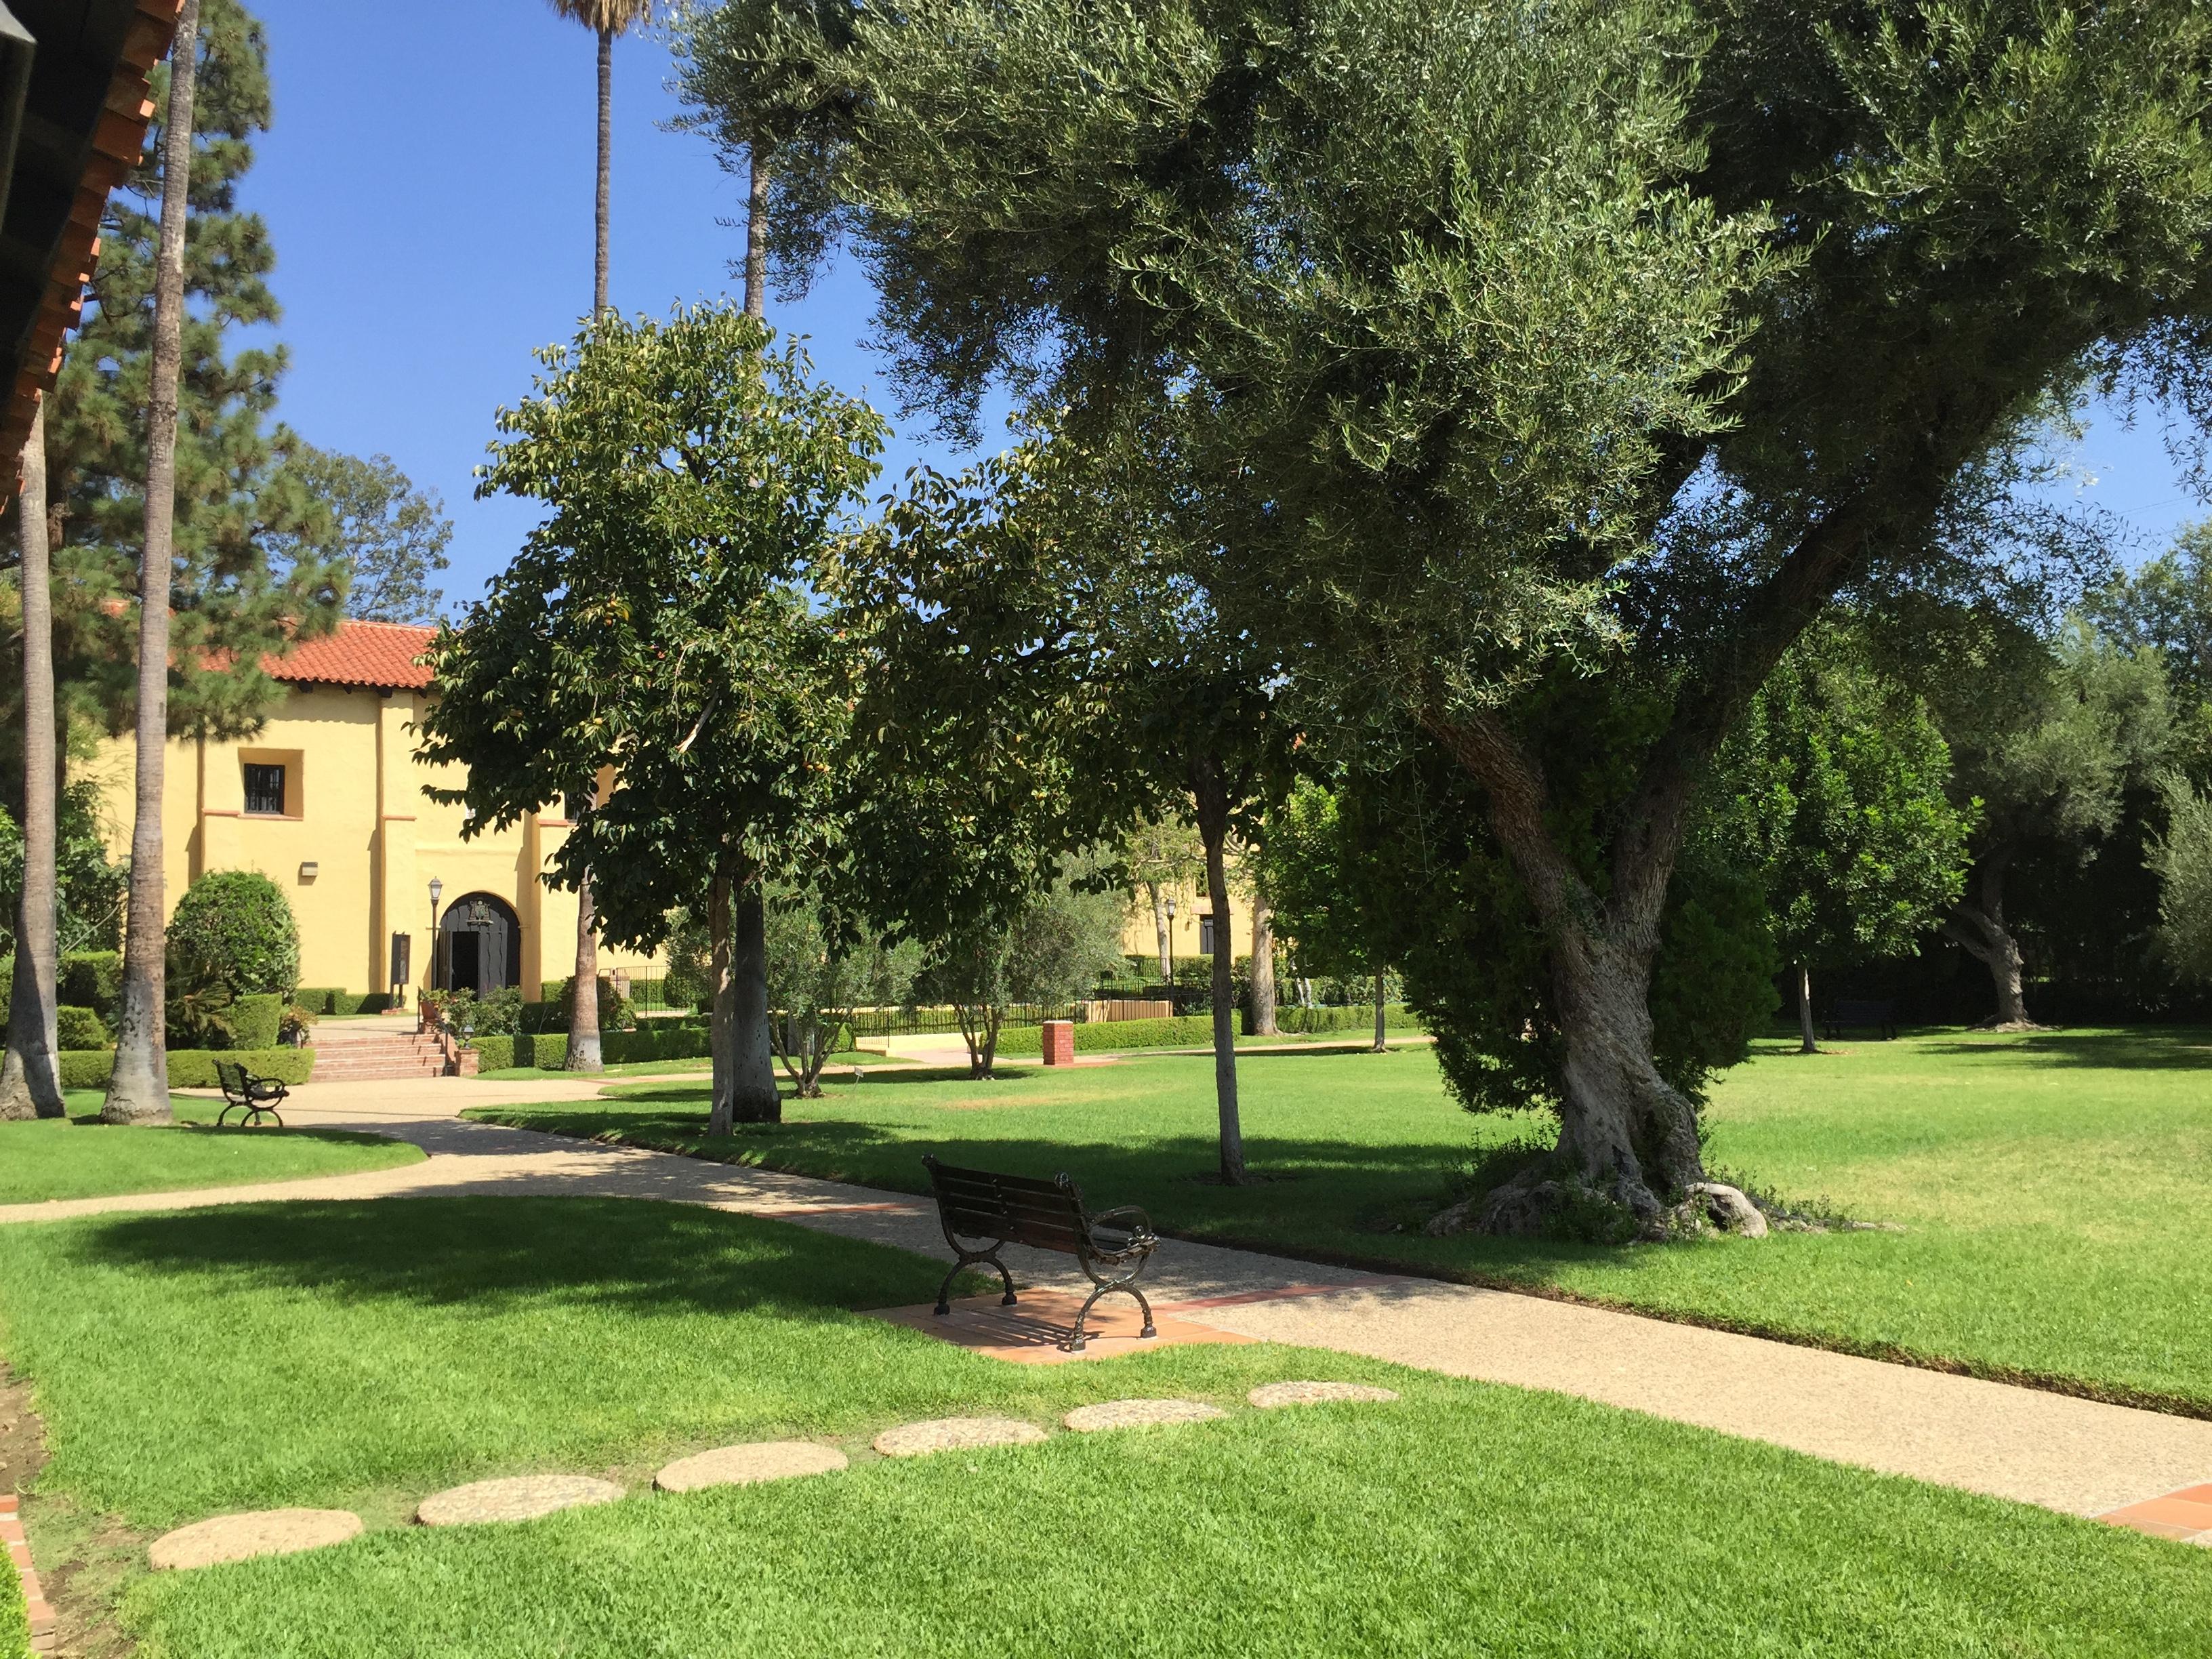 San Fernando Mission courtyard - ventura santa Barbara san Fernando Missions